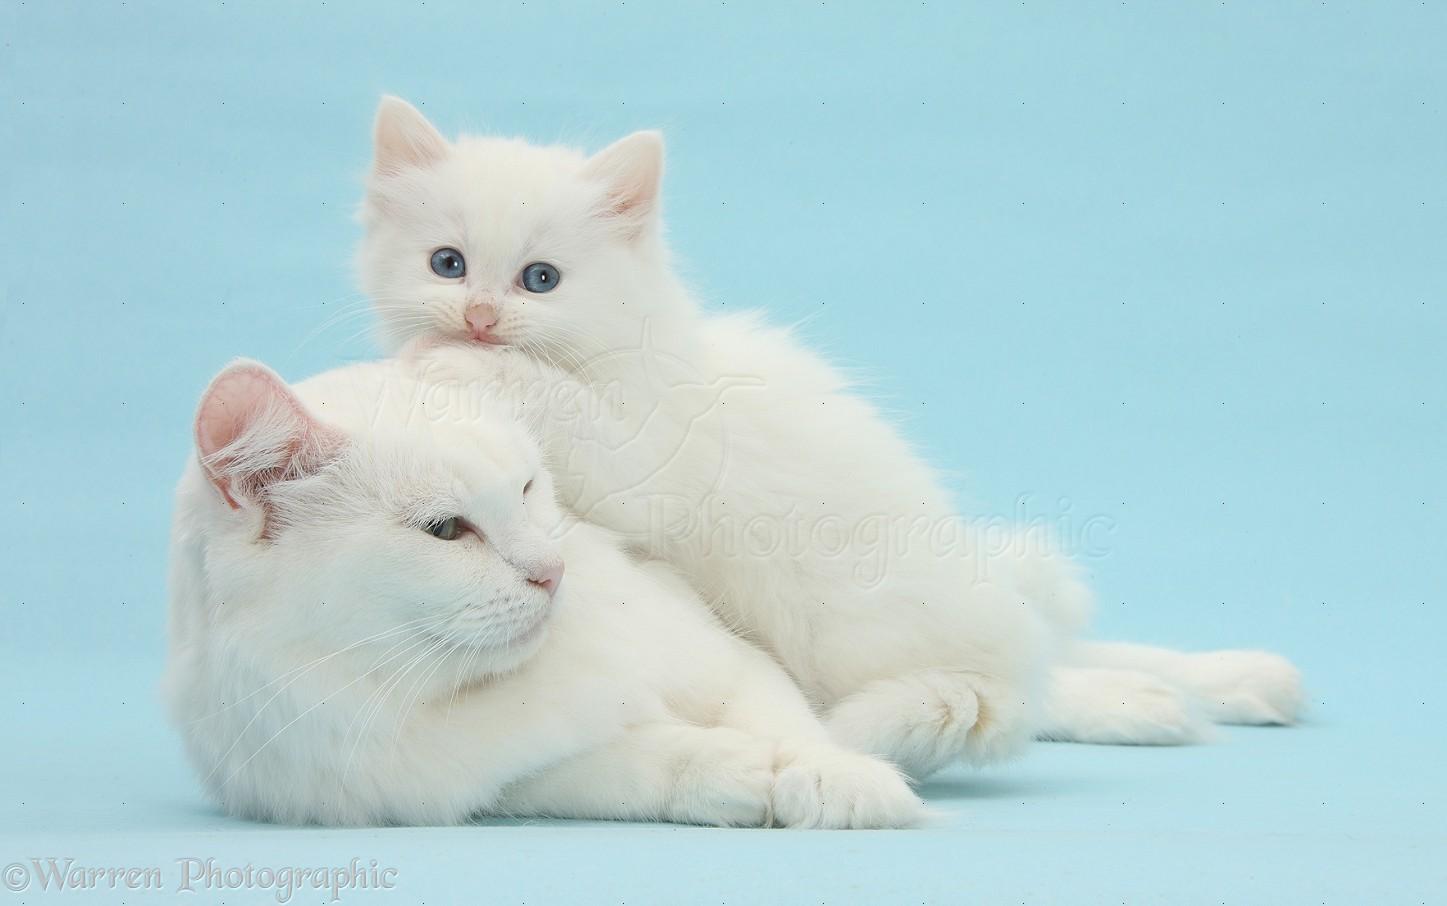 White kitten lounging on blue background photo WP39880   White Cats Blue Background